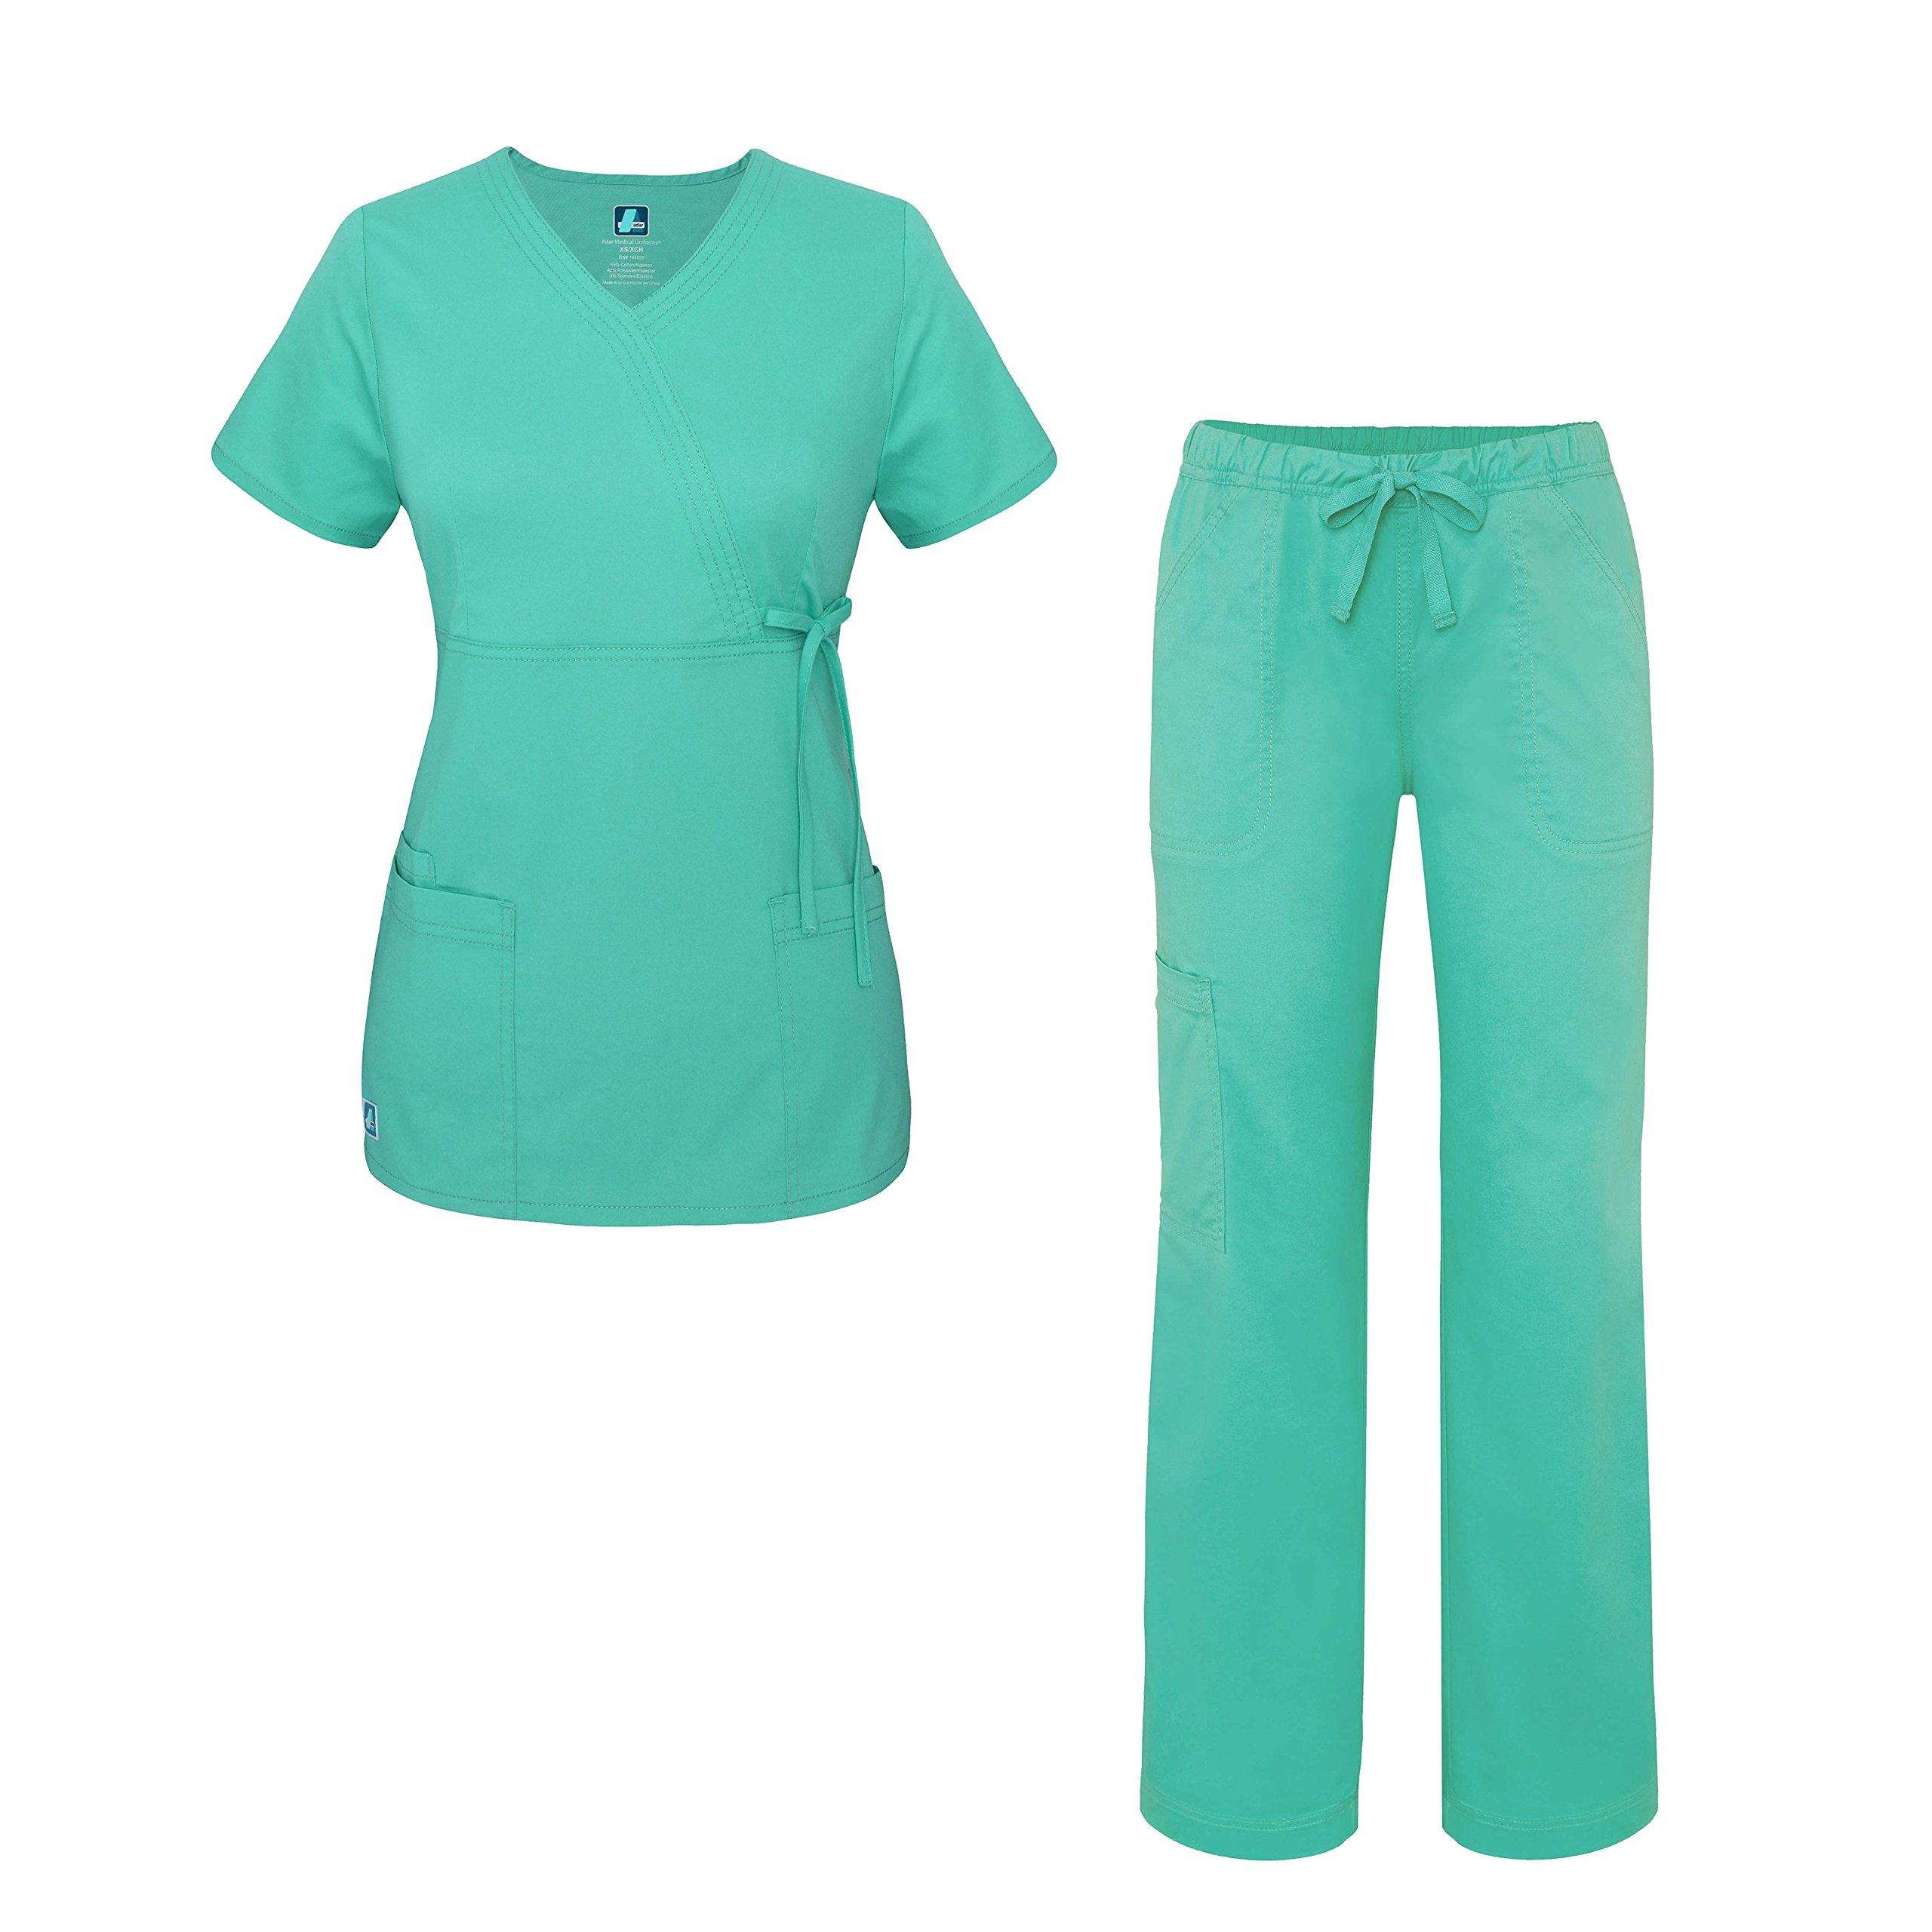 Pop-Stretch Junior Fit Women's Scrub Set - Mock Wrap Tie Top and Cargo Pants - 3502 - Sea Glass - S